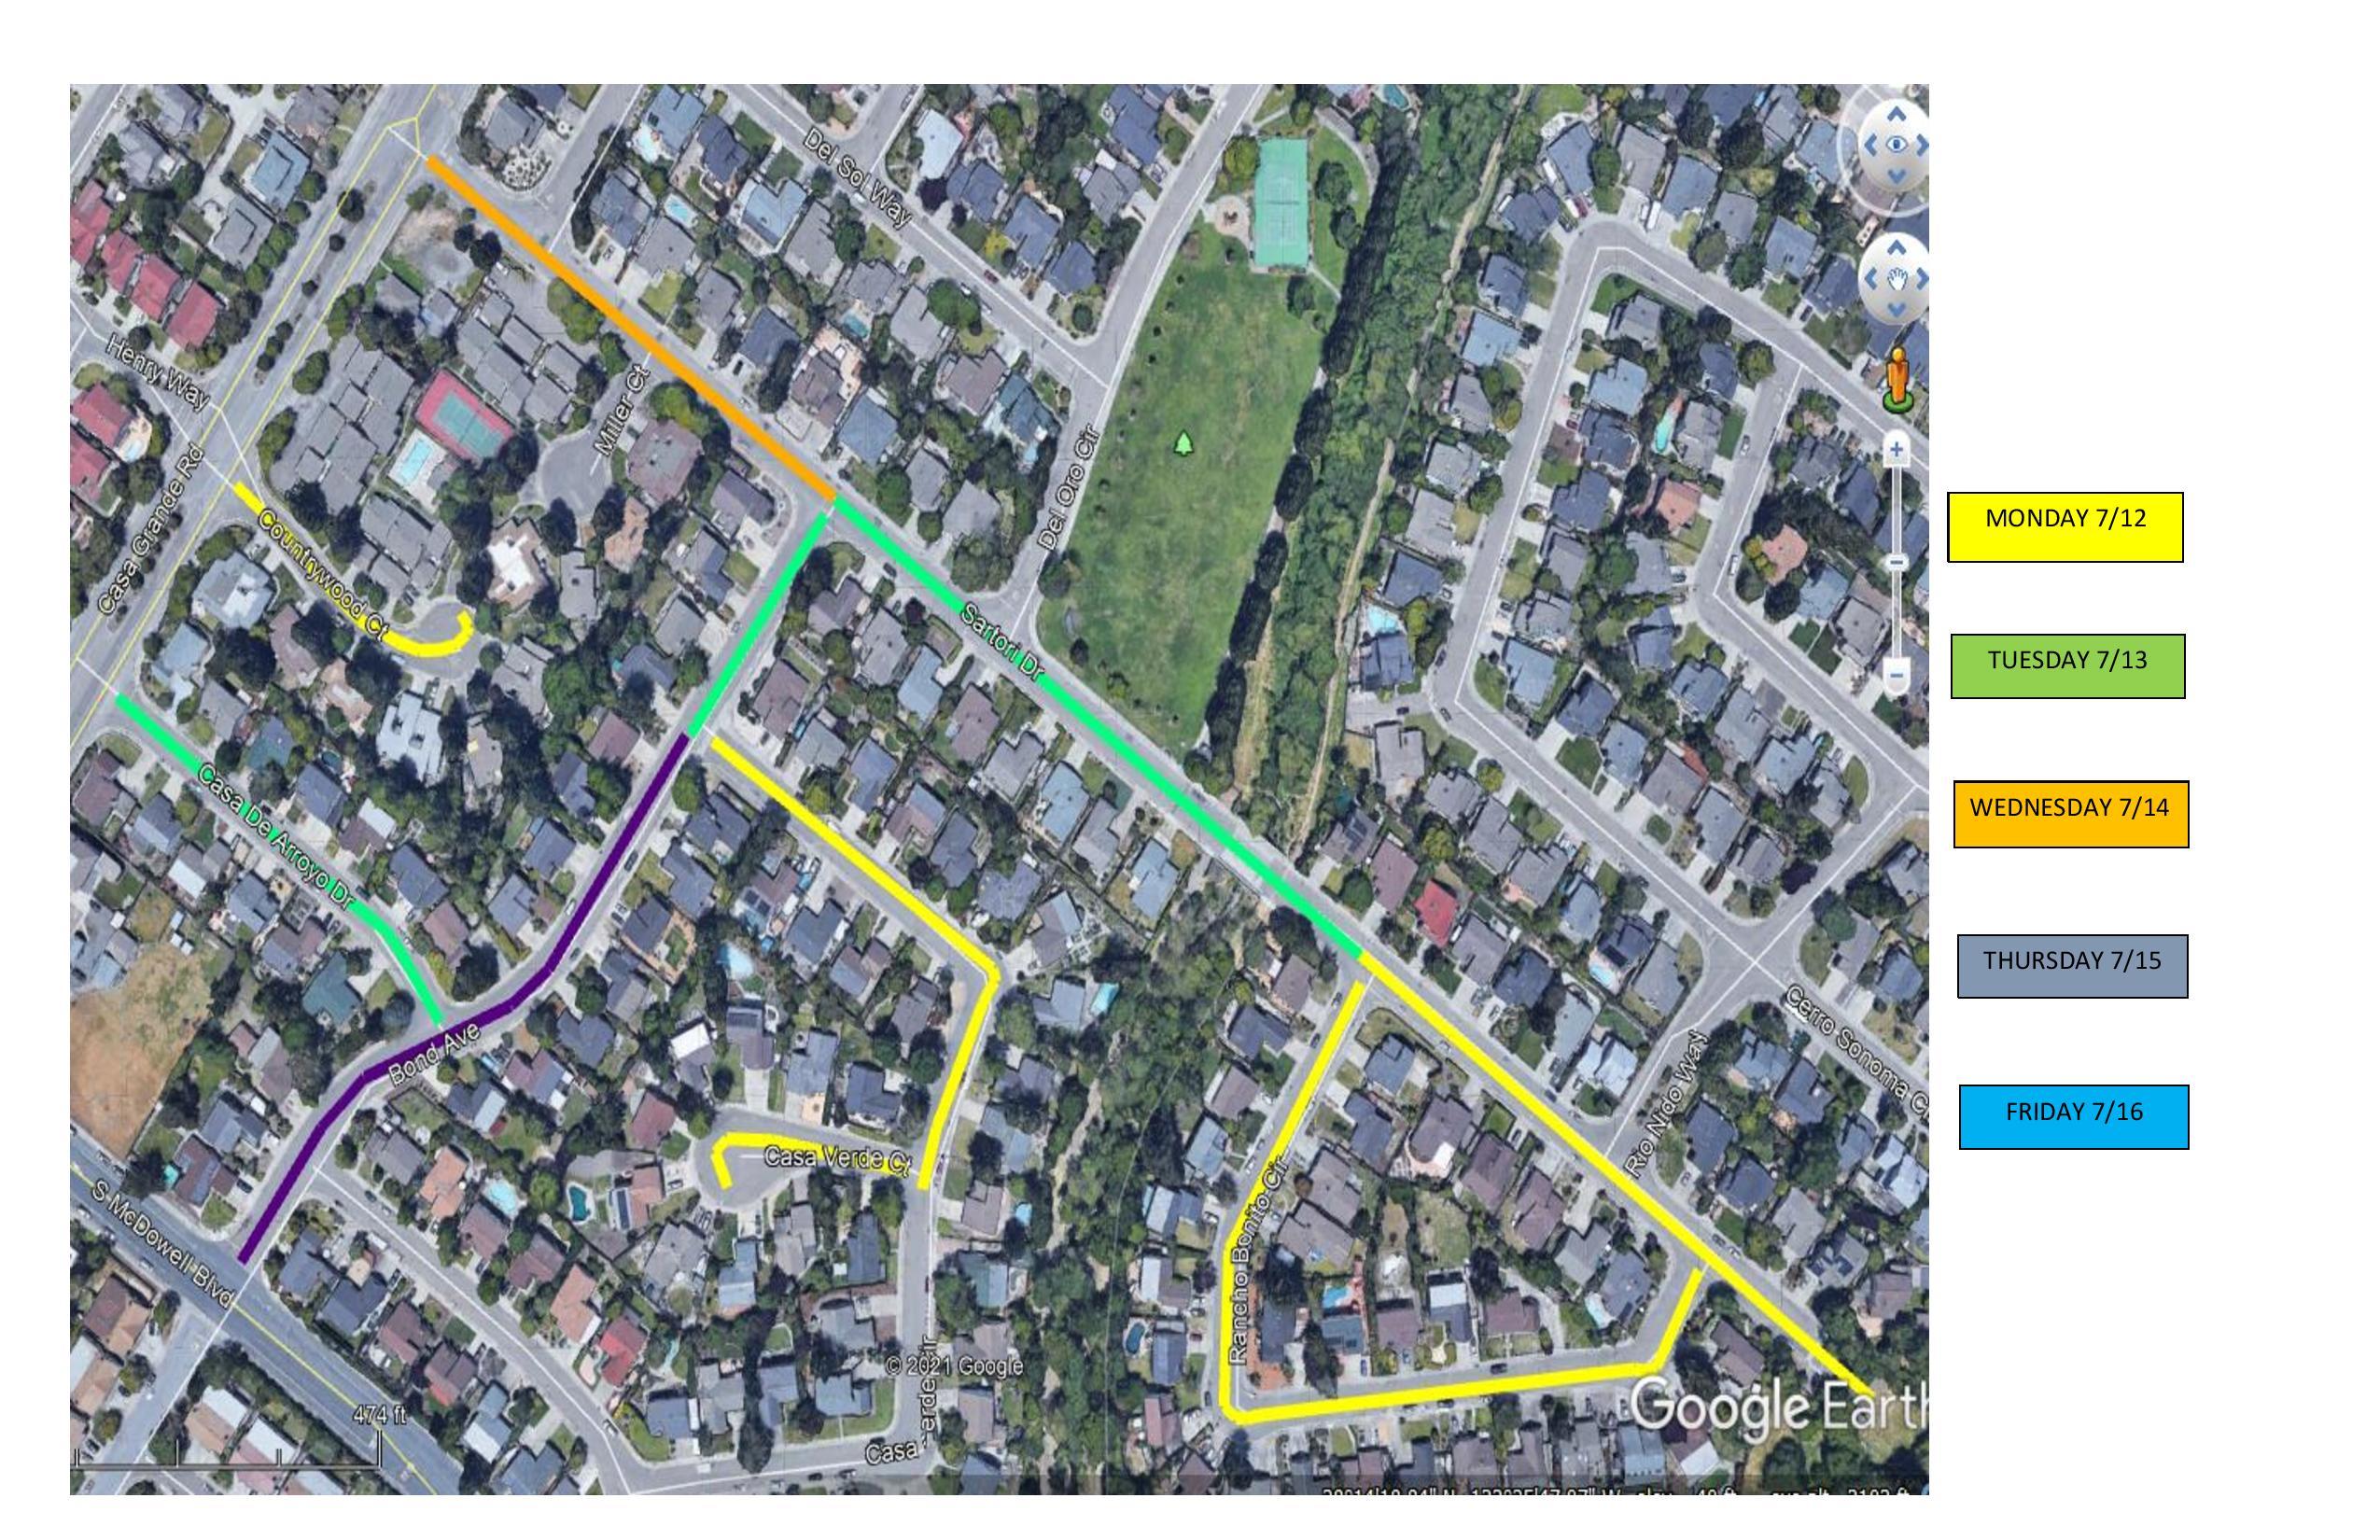 Pavement Map 1 7_12 thru 7_16